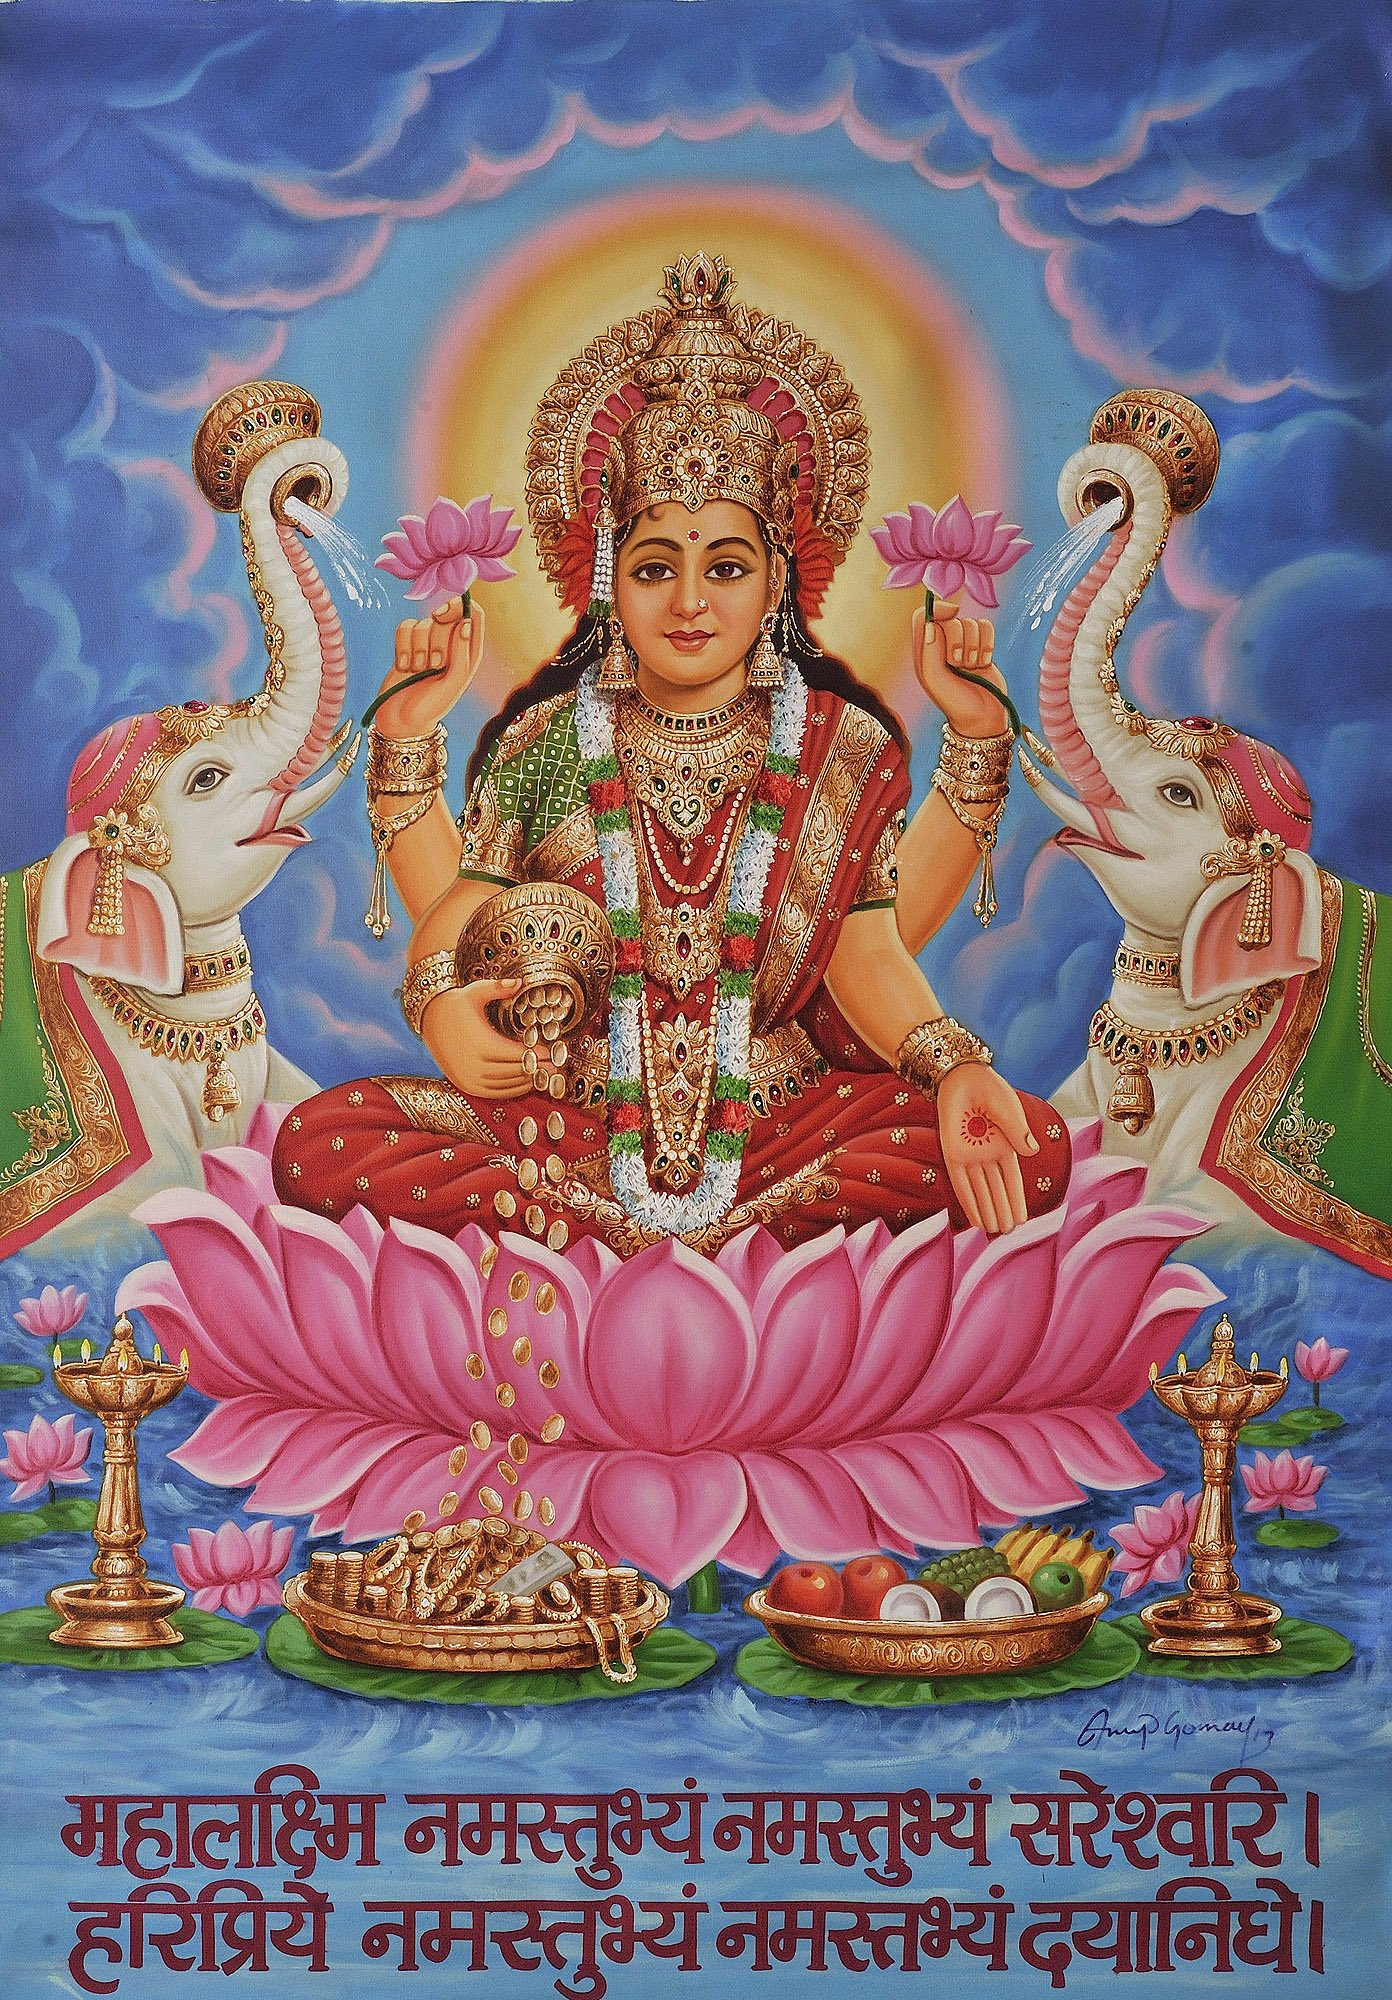 Goddess Lakshmi - Oil on Canvas - Artist: Anup Gomay